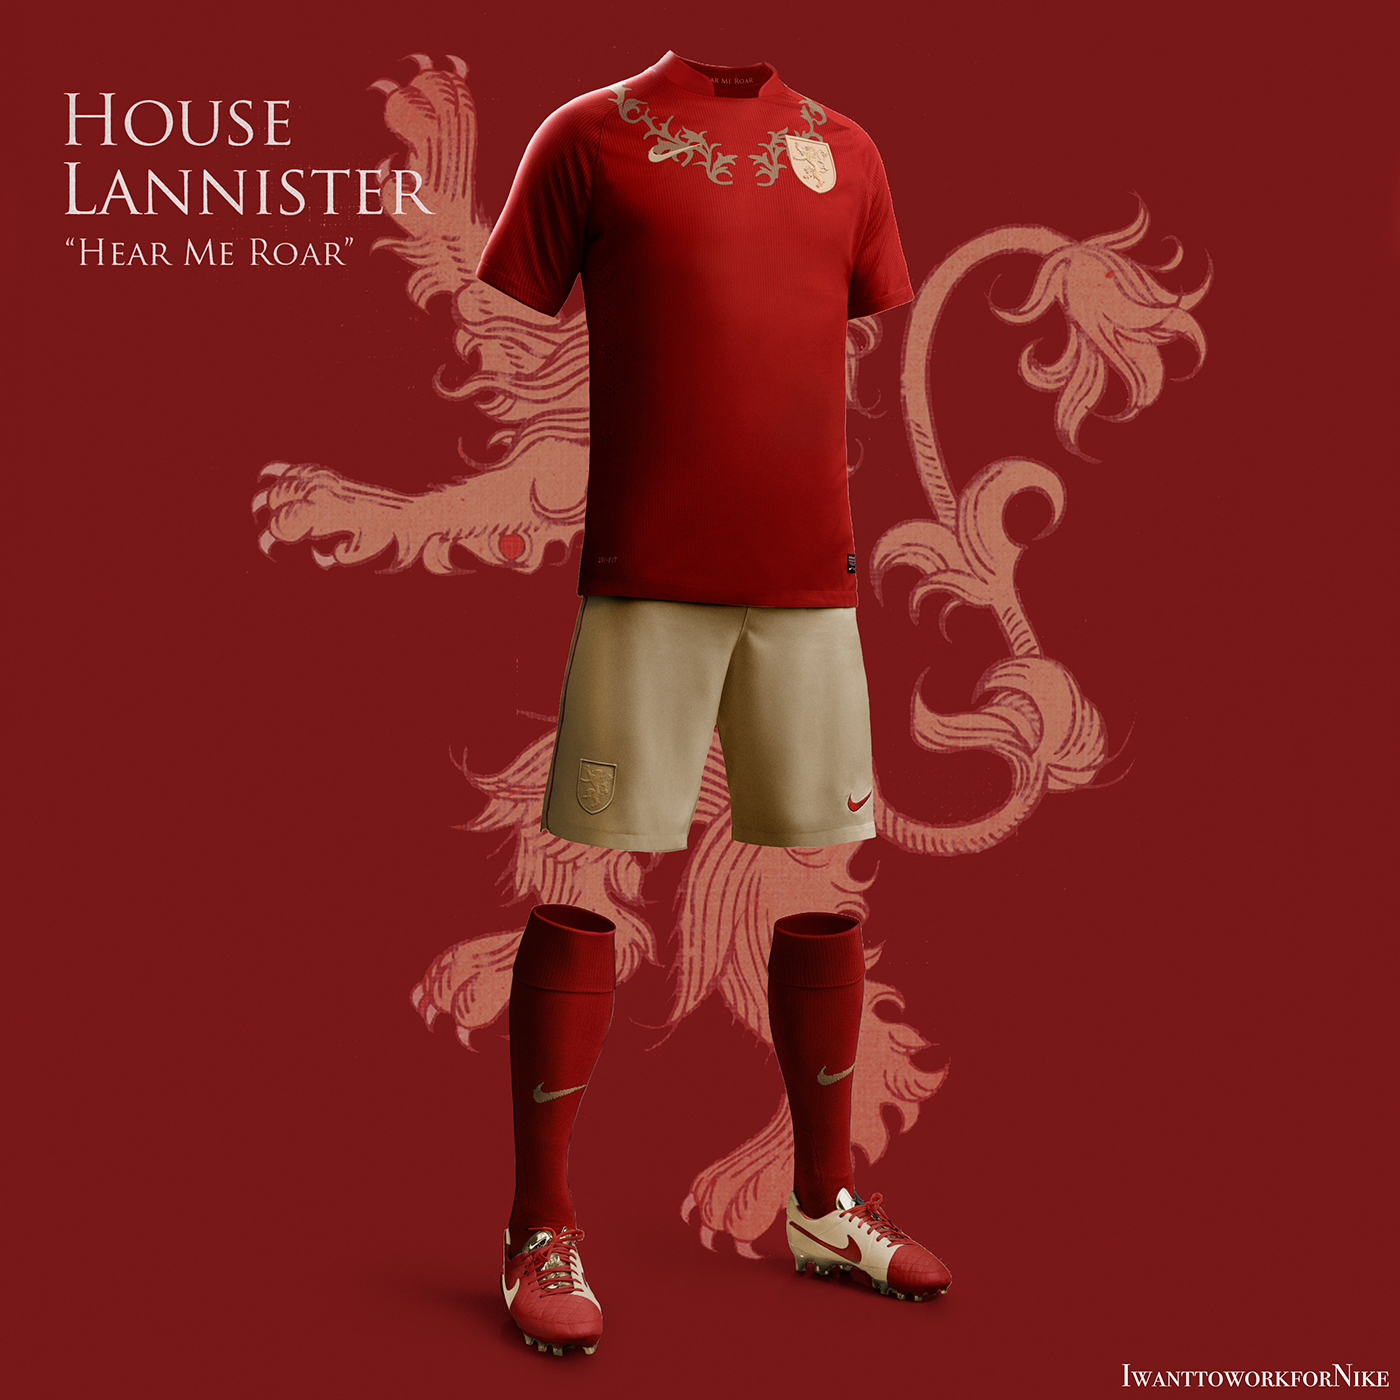 got Game of Thrones house stark Nike football soccer Nerea Palacios got kit got football